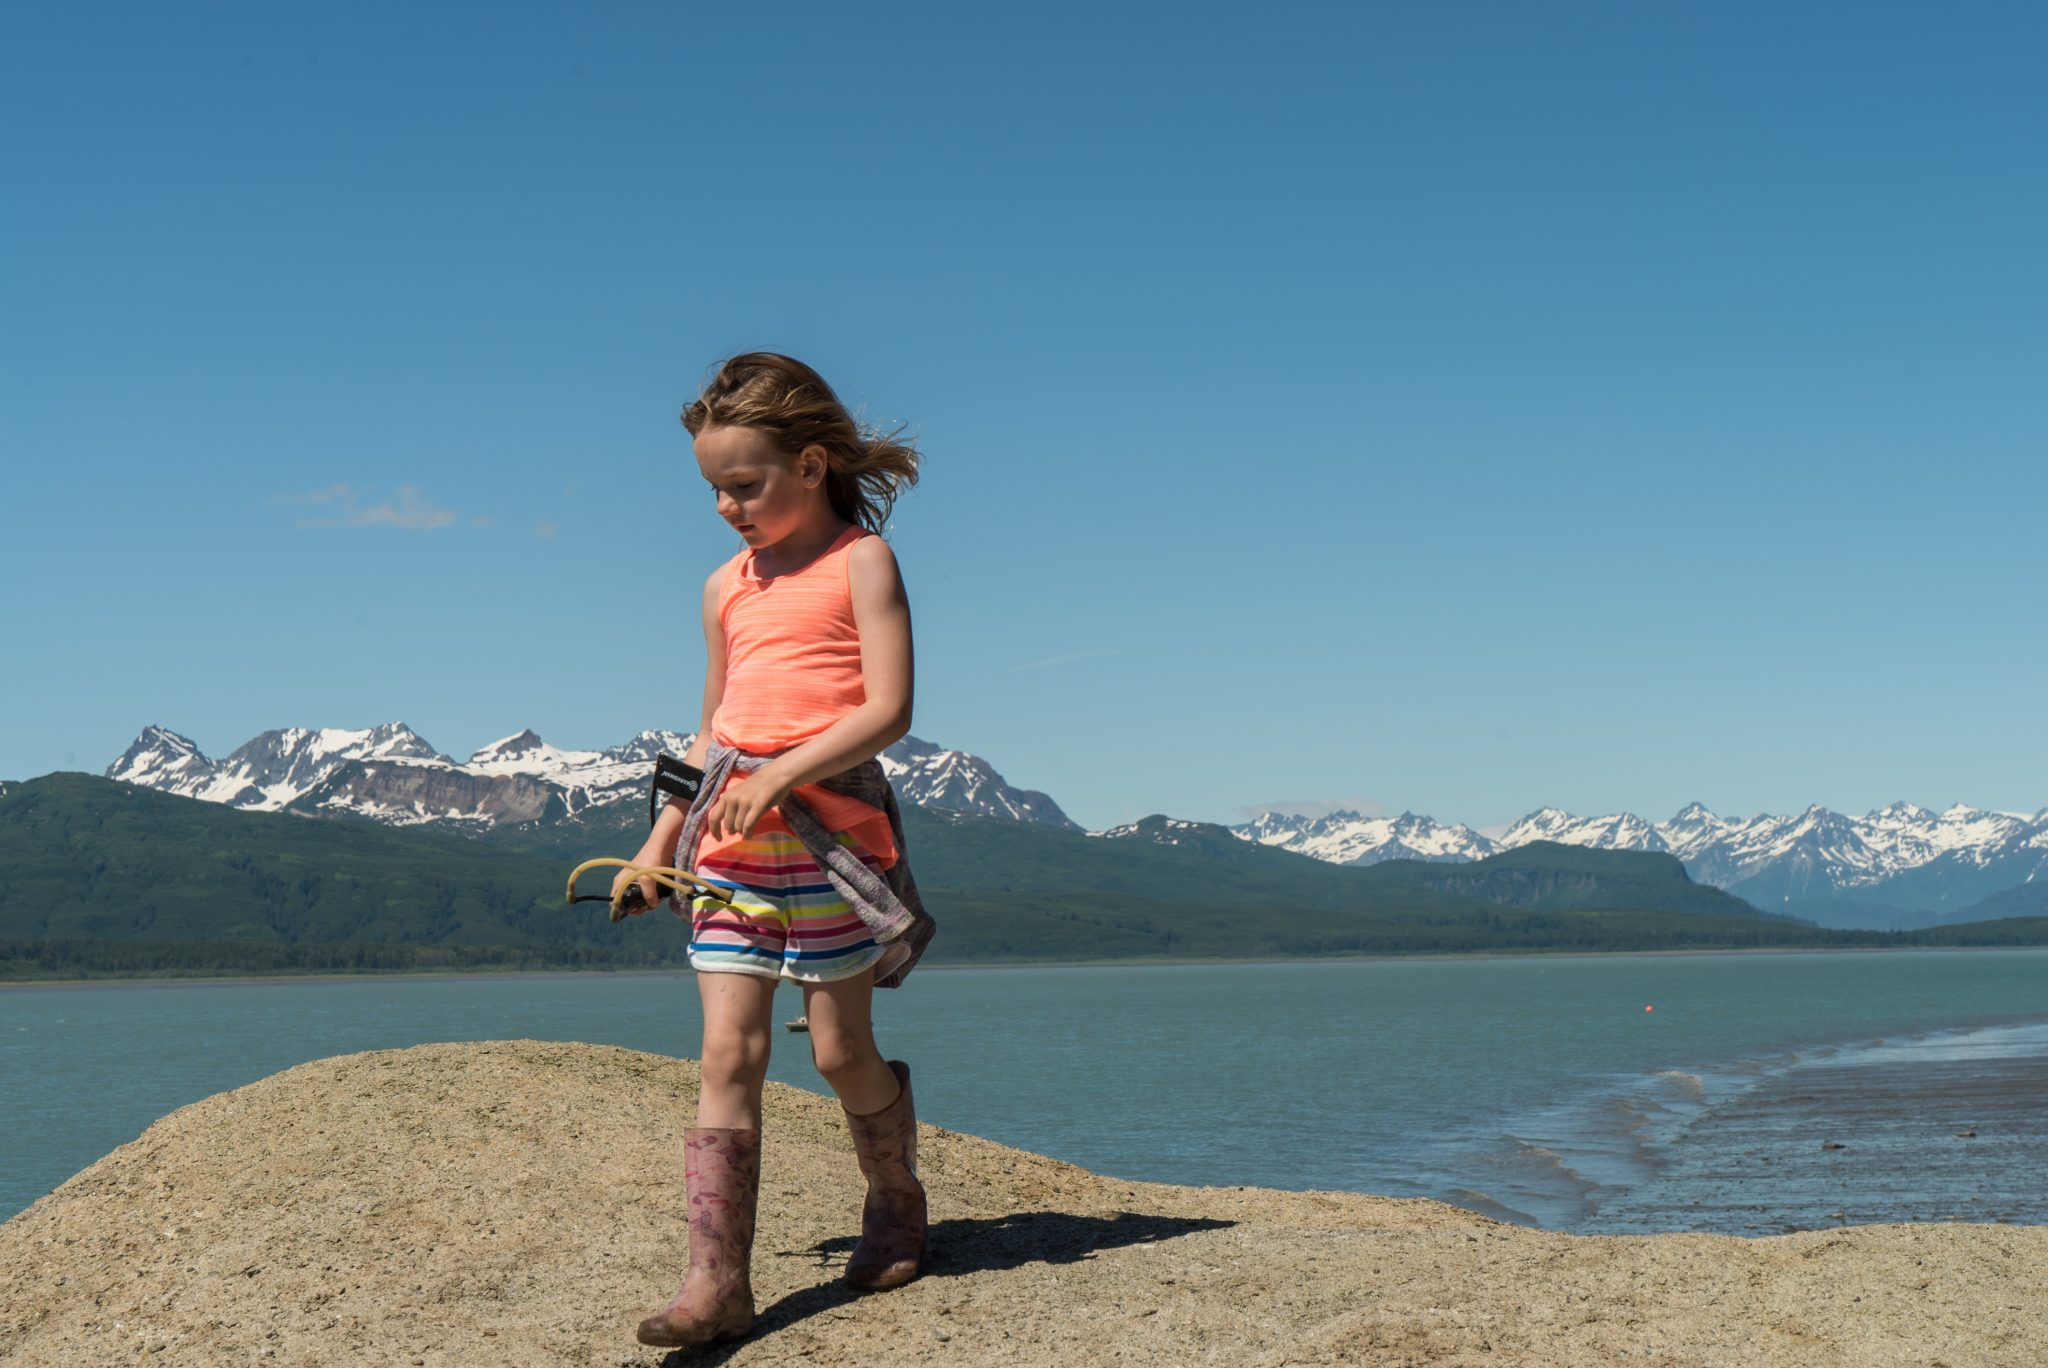 alaska-kids-mountain-snug-harbor-DSC06754